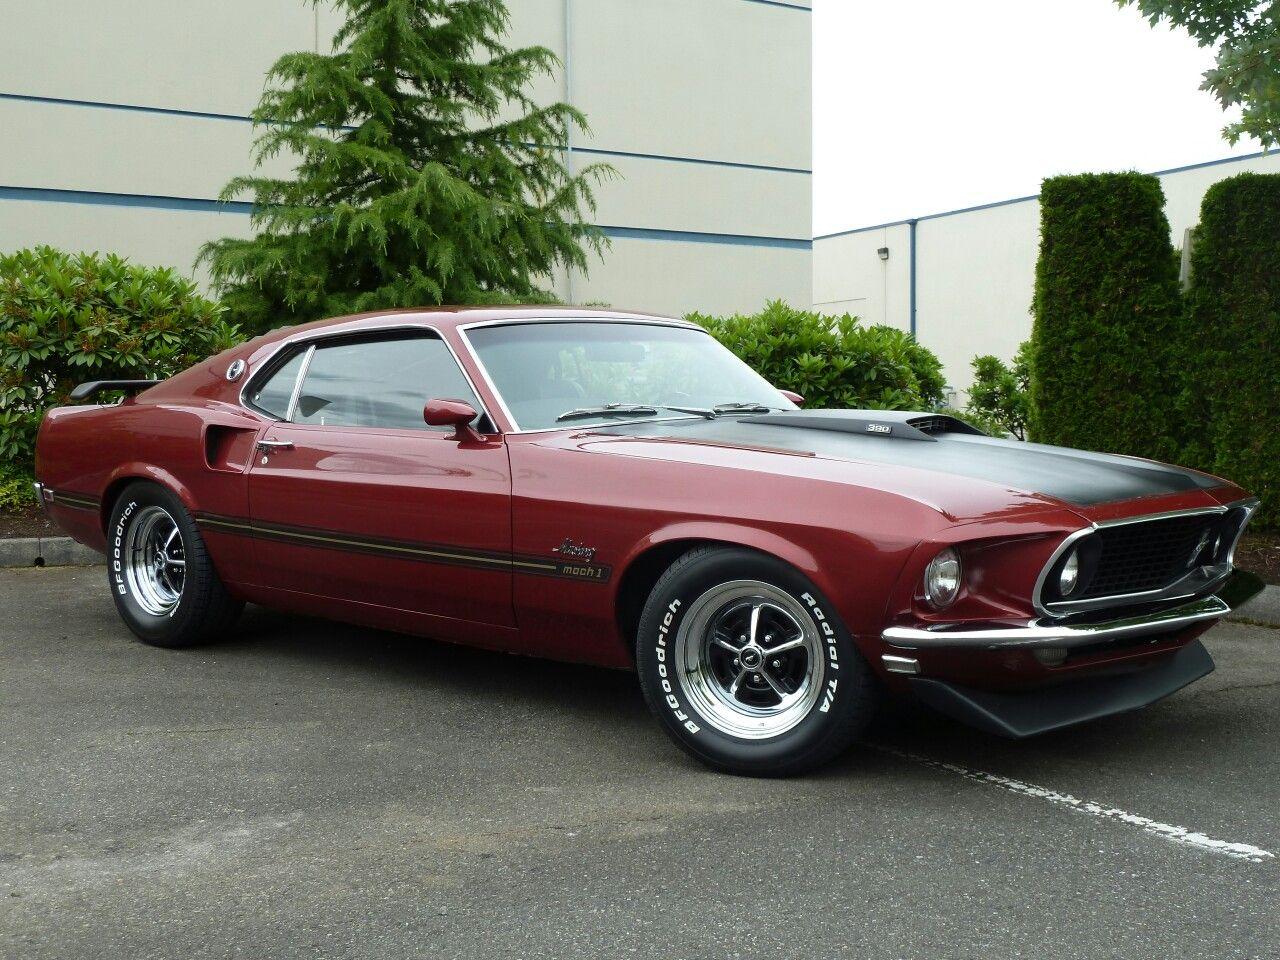 1969 Mustang Shelby Gt500 Eleanor